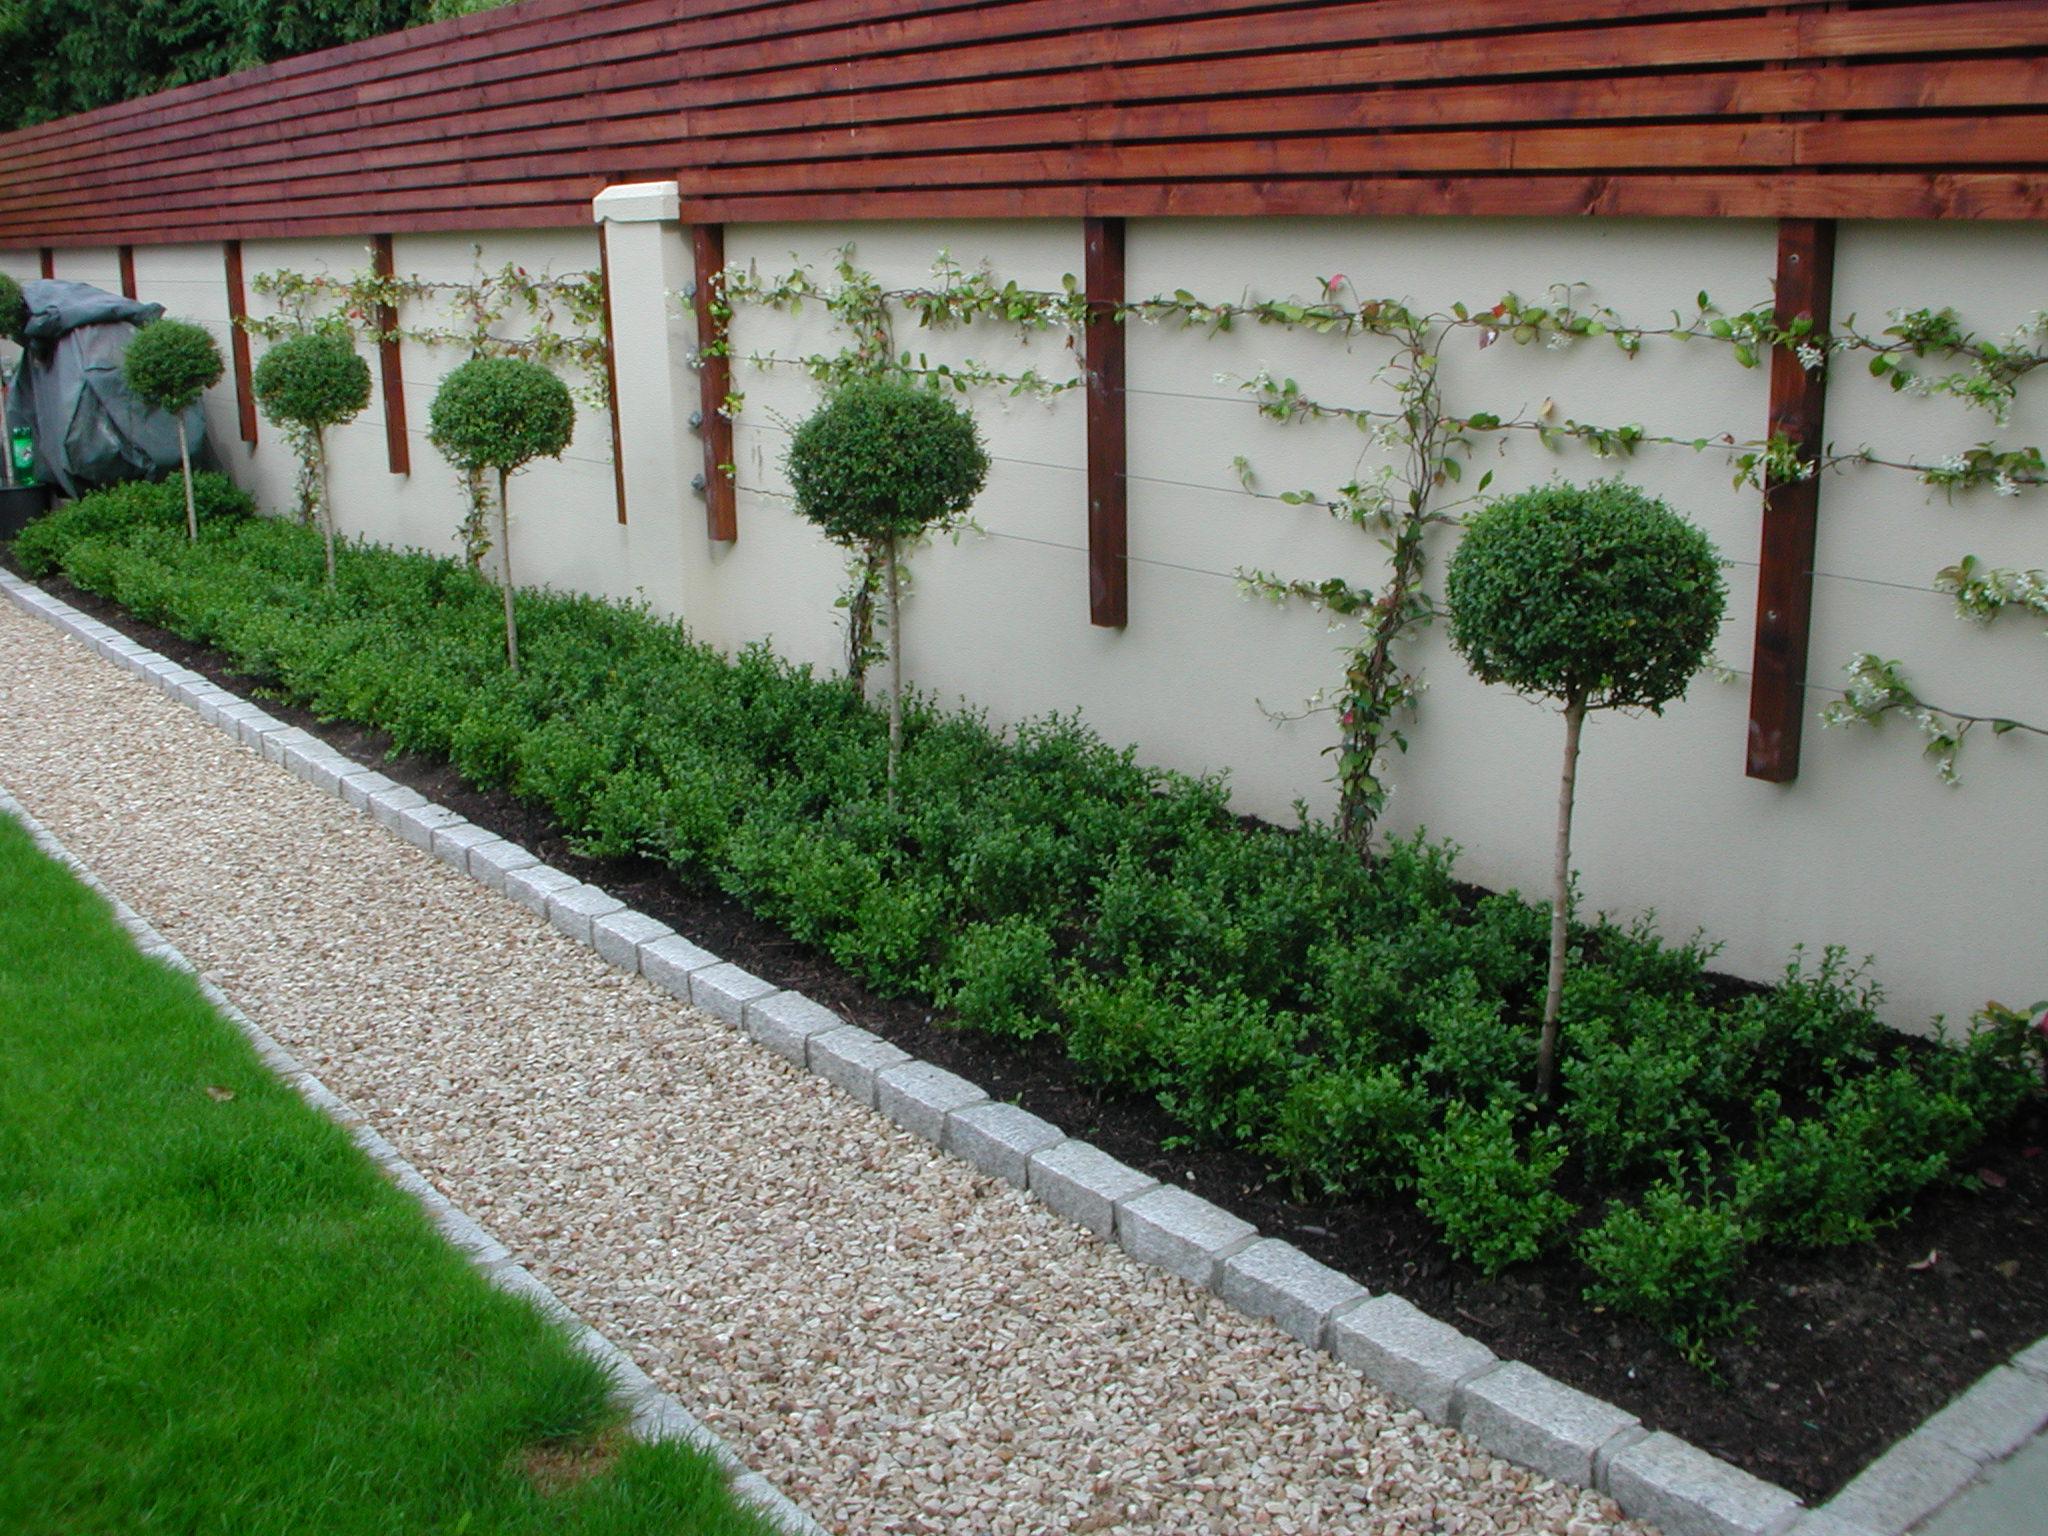 Charming Garden Fence Designs. Wall Extension Garden Fence Designs